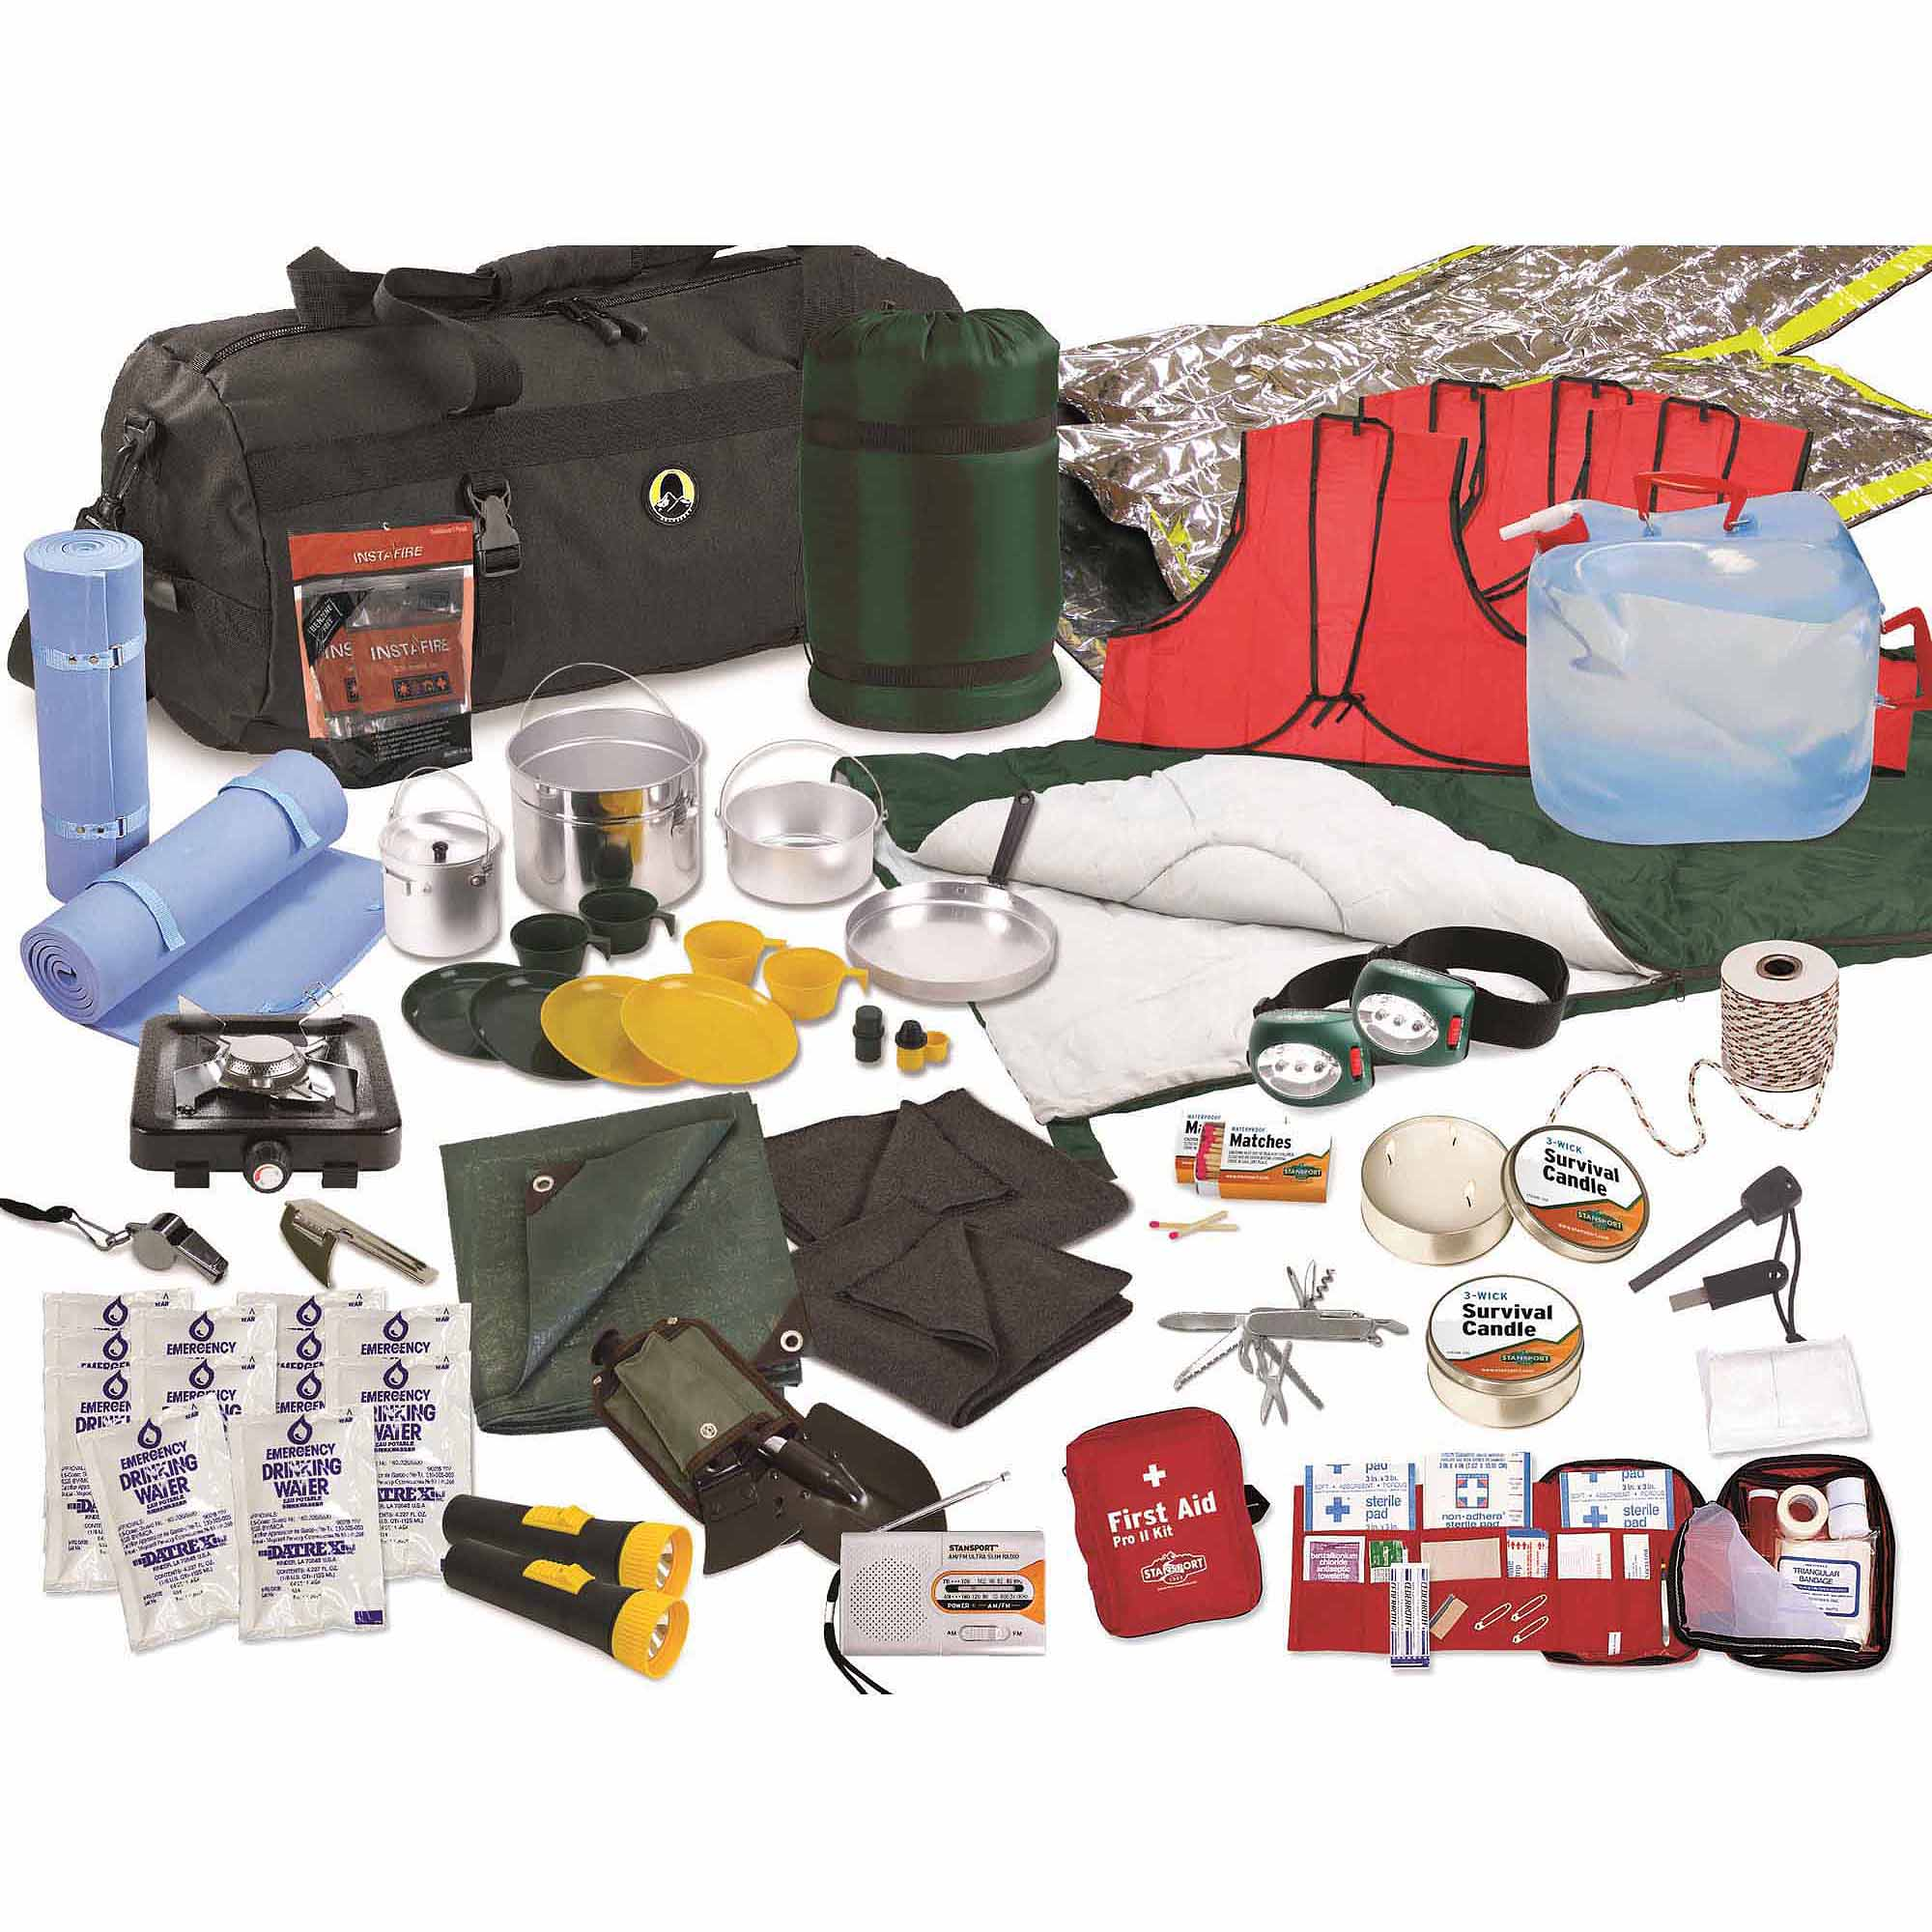 Emergency Family Prep Kit II by Stansport